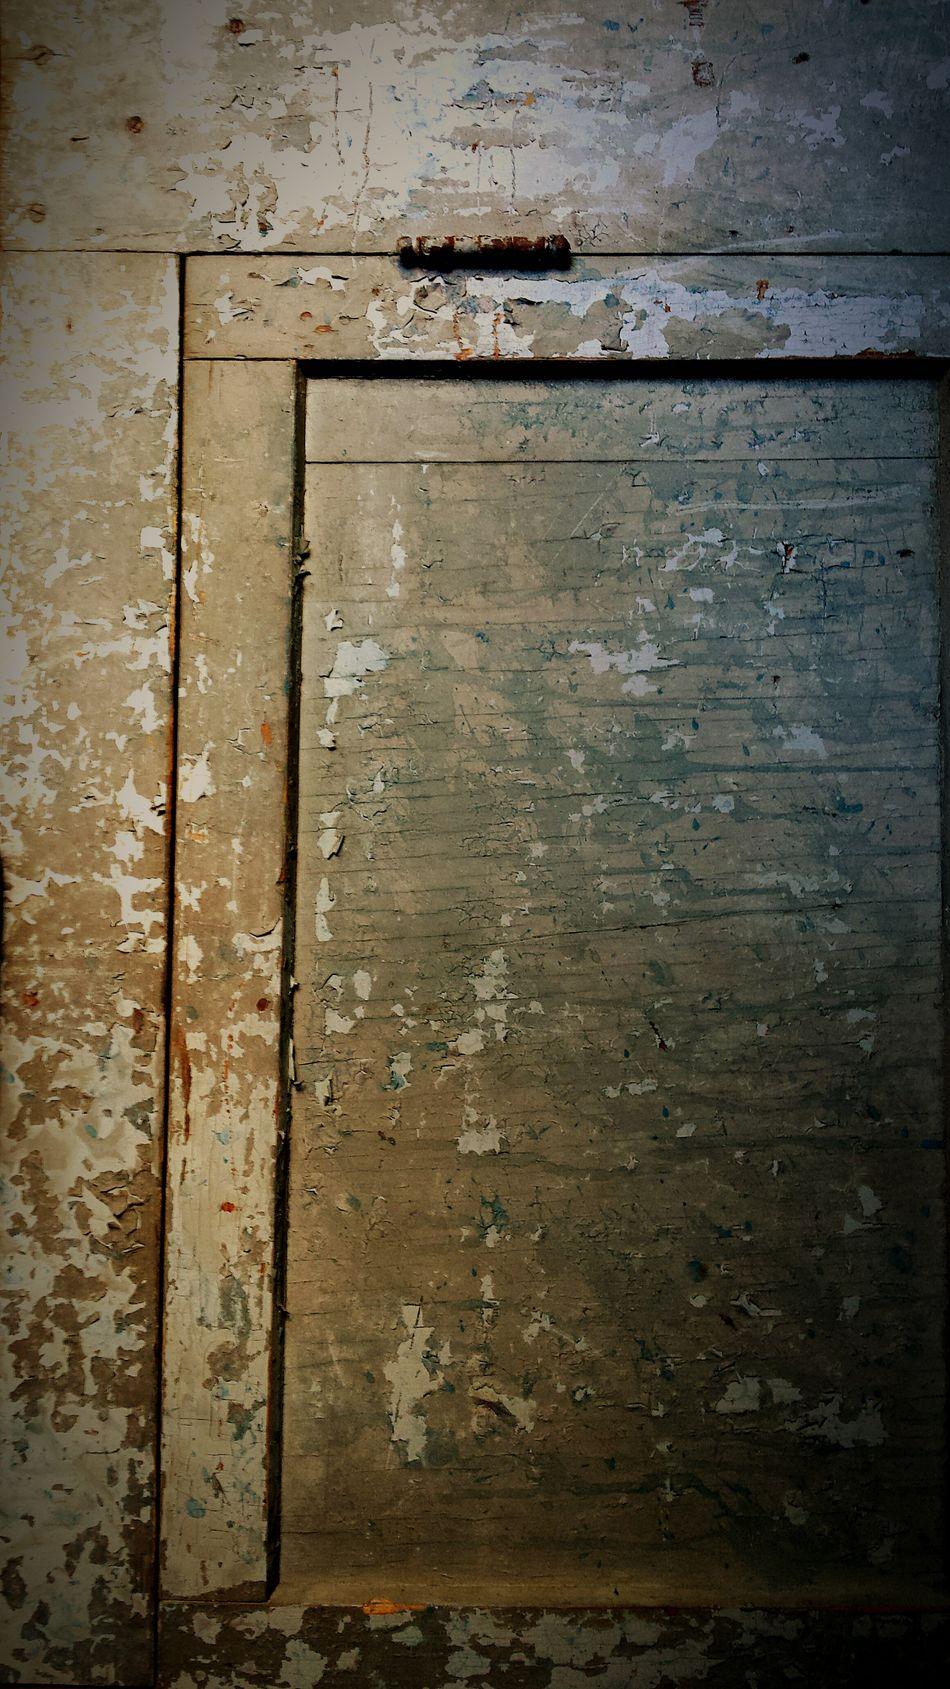 Beautiful old cabnet door On A Break Working Observing Light And Shadow Taking Photos Urban Filter 4 Textures And Surfaces Paint Decay Wooden Door Old Door